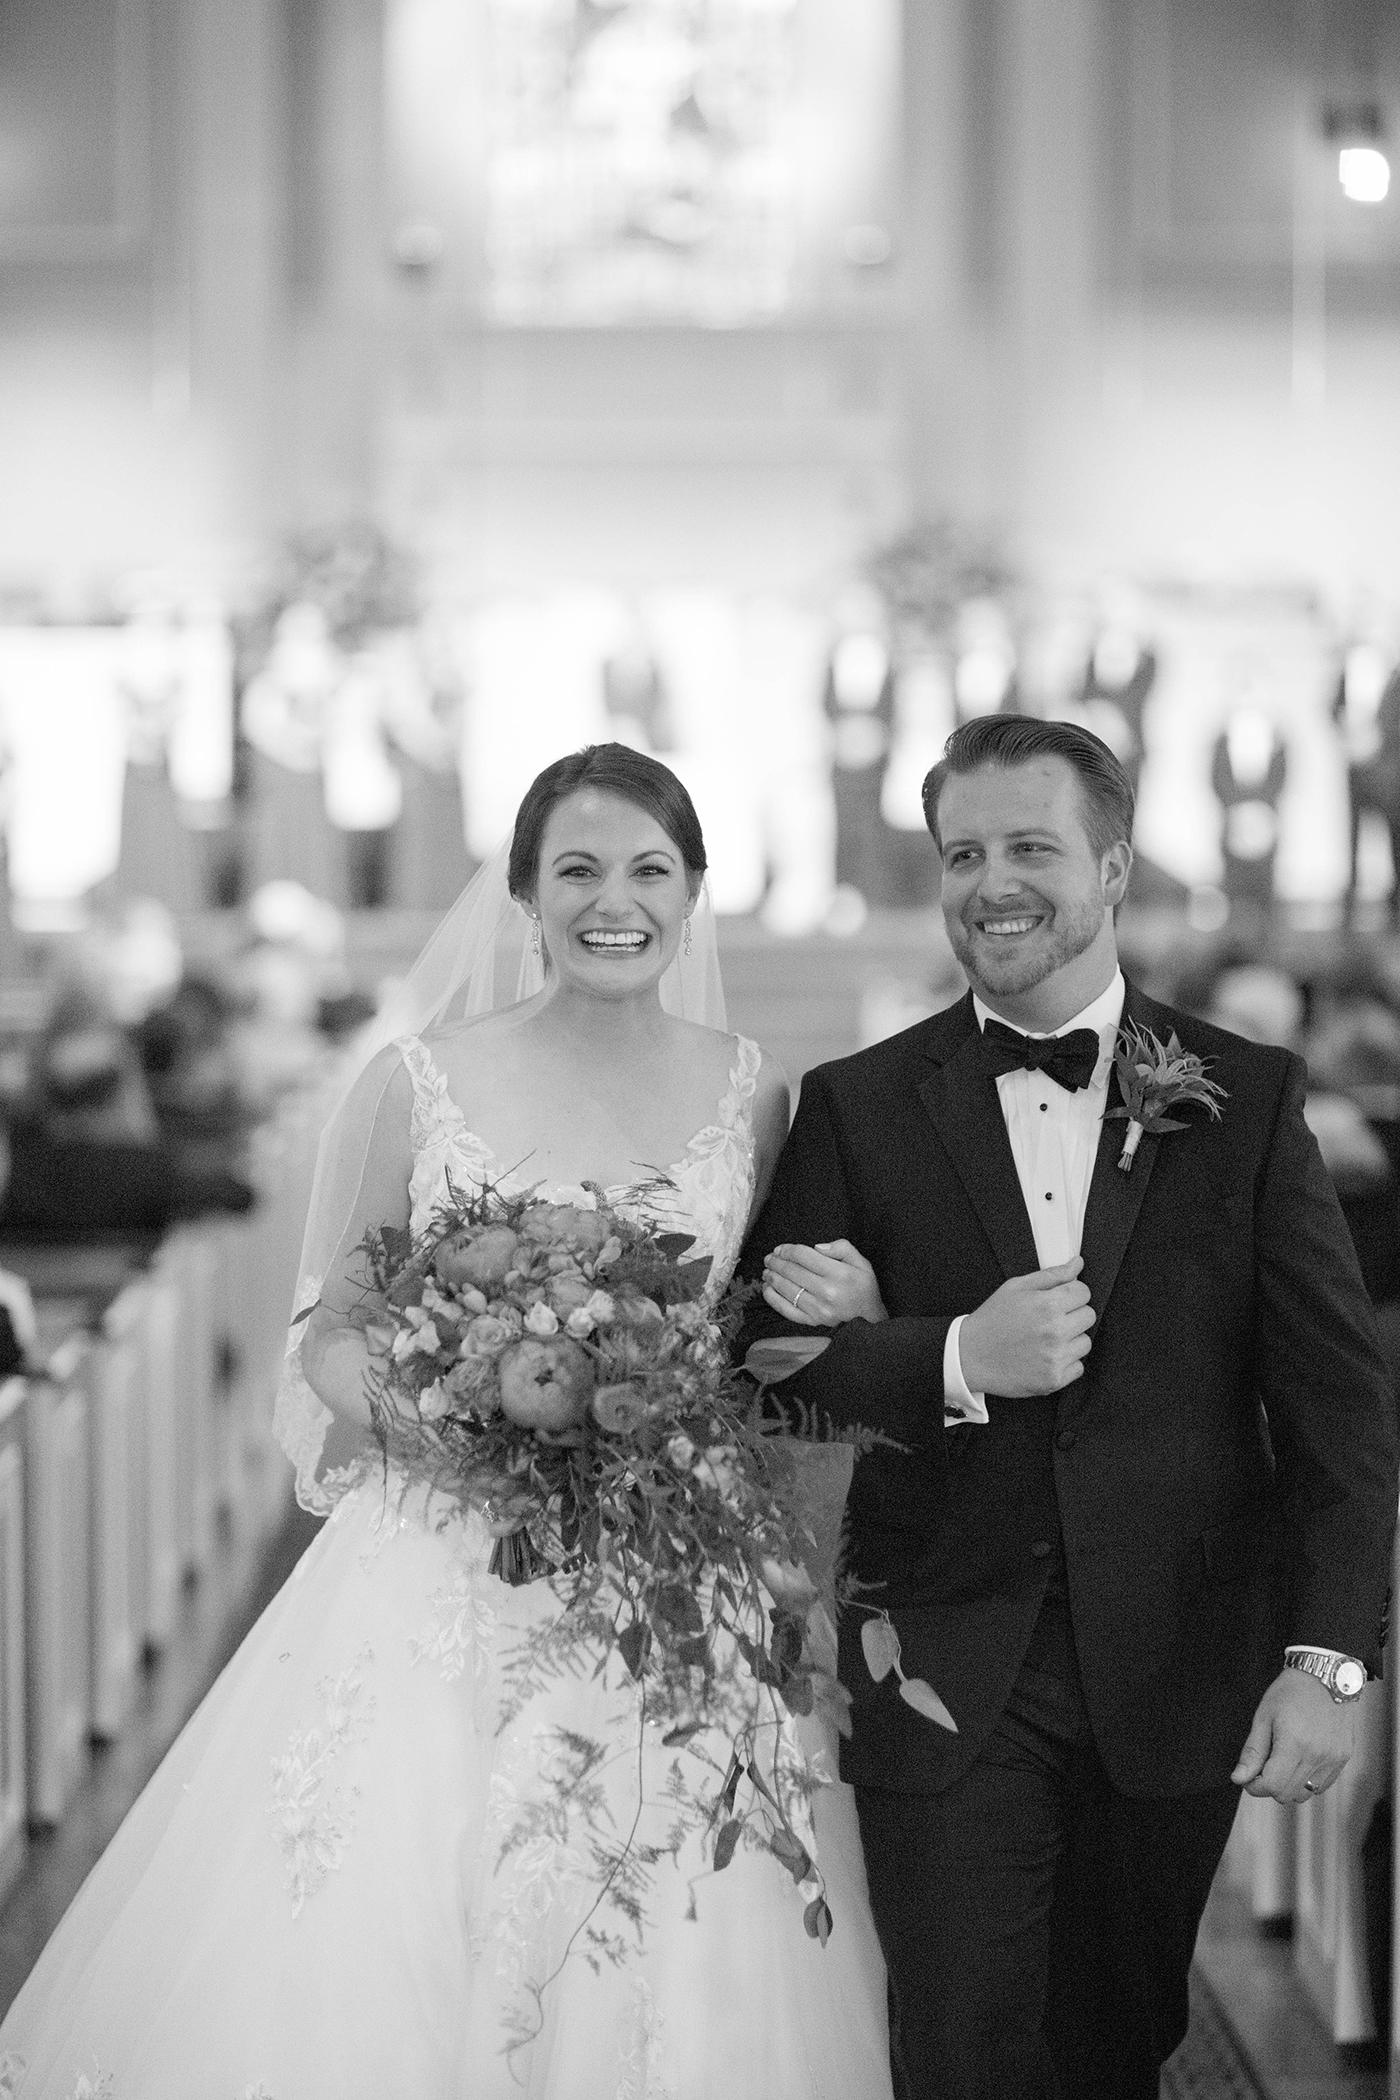 Dallas TX Wedding Planner - Allday Events - Hall on Dragon Wedding - 00019.jpg